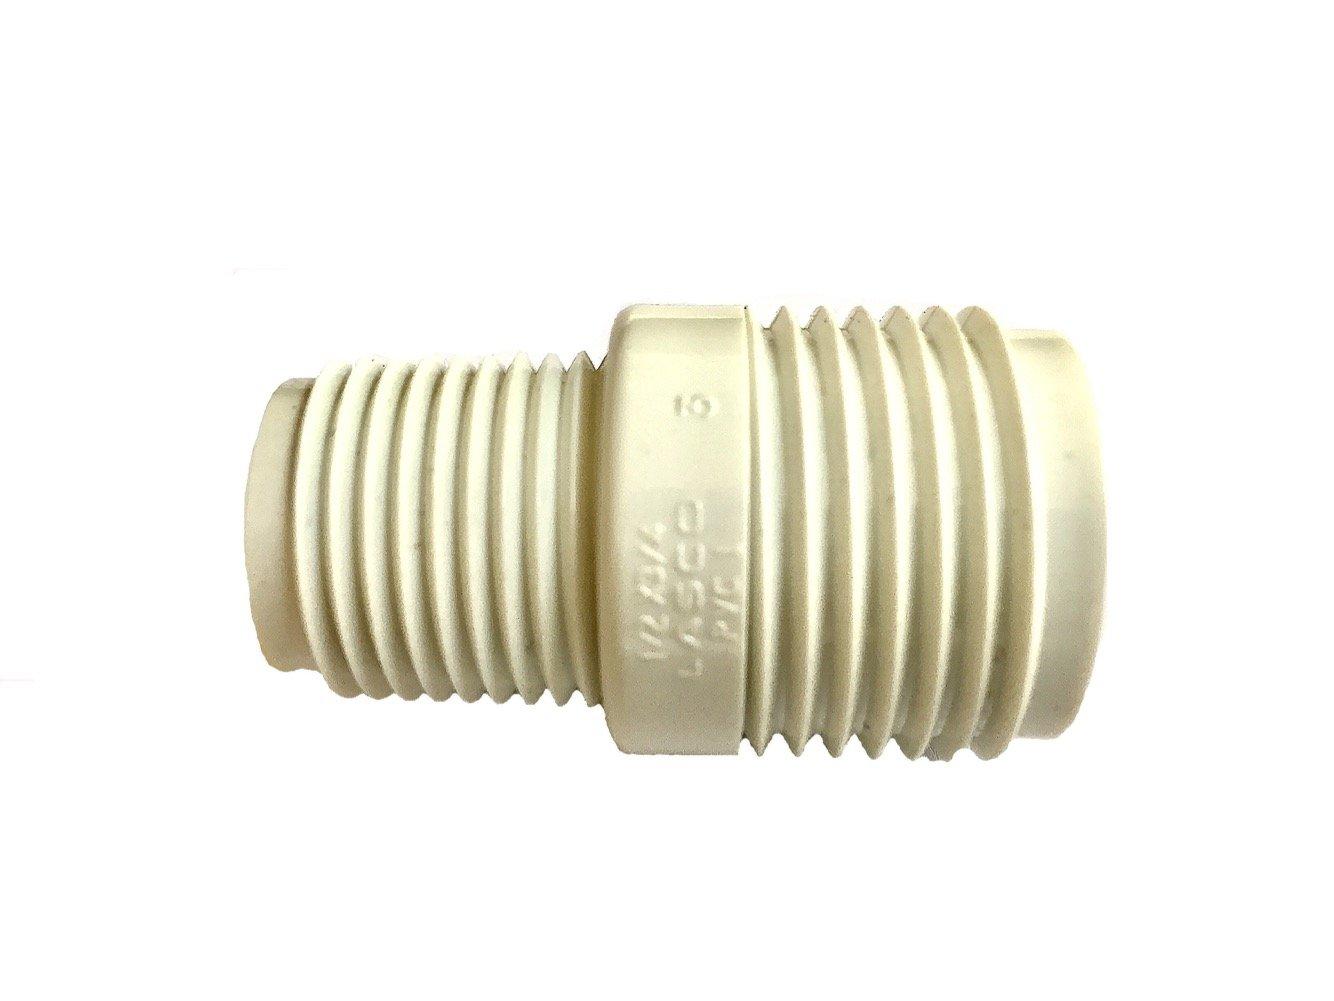 "PVC Garden Hose Adapter (Male 1/2"" NPTx 3/4"" GHT) for Rain Barrels, Garden Spigot, Water Tanks, Ponds, Aquariums"